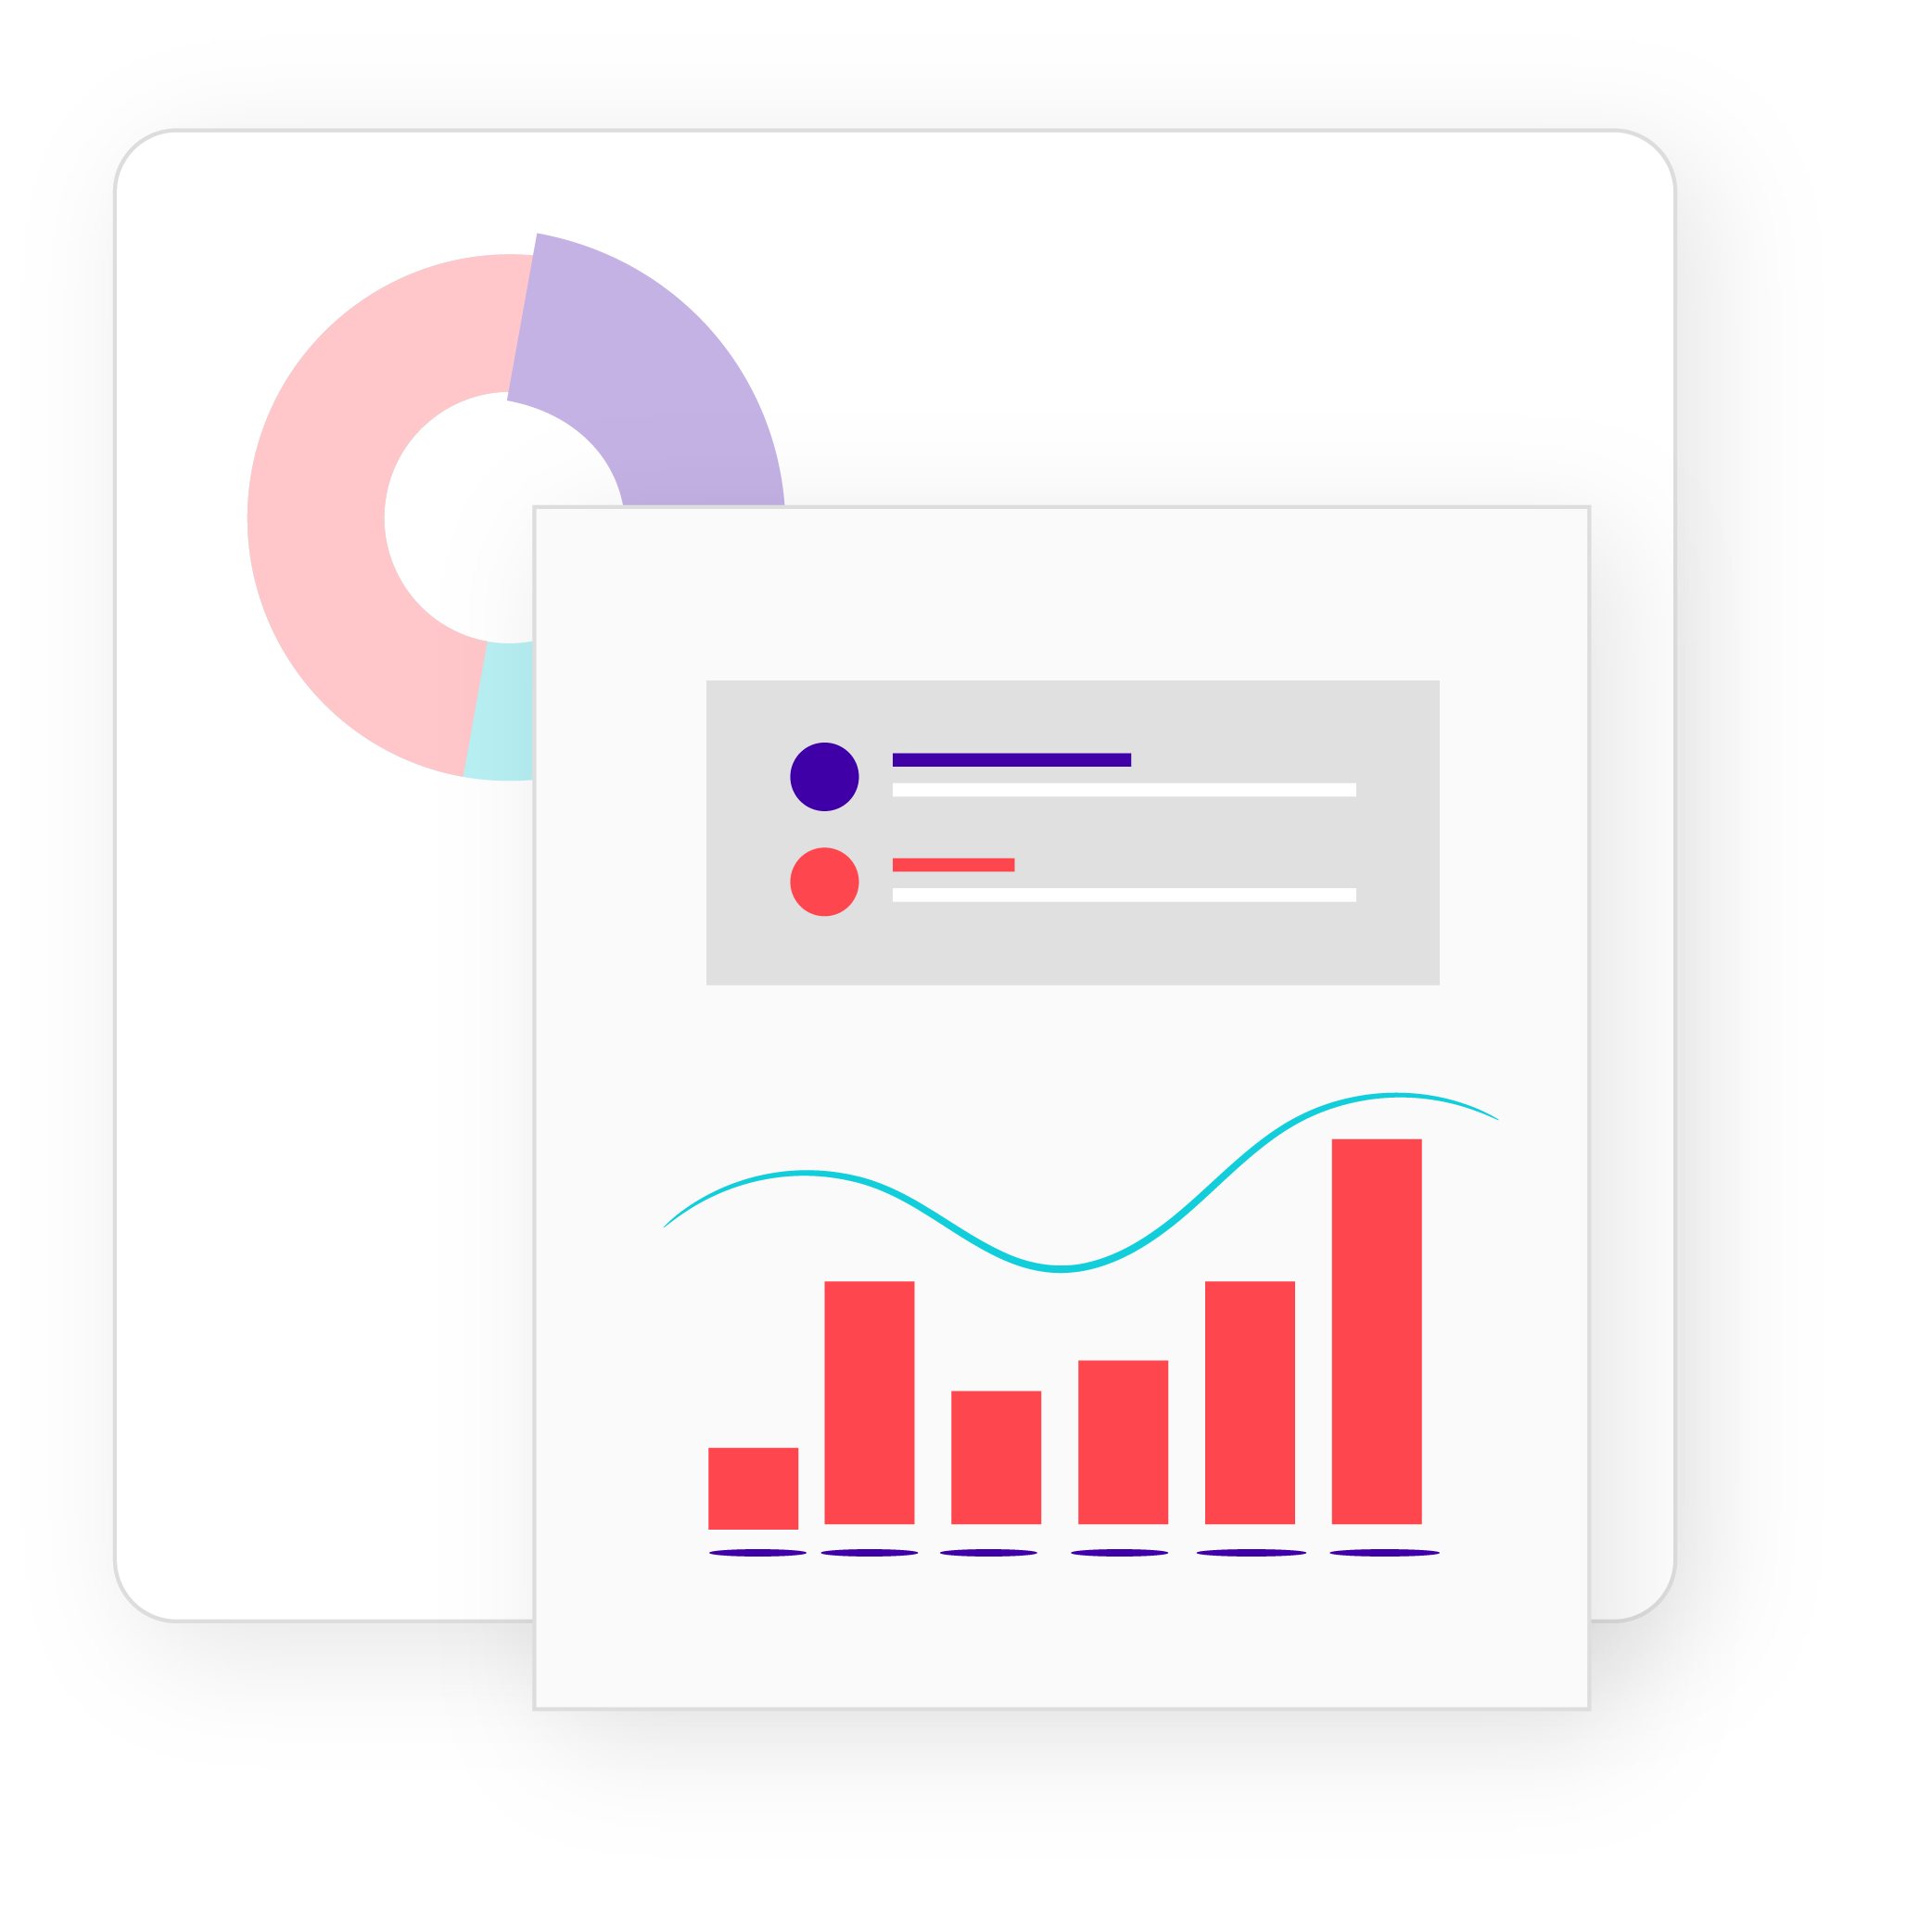 bar graph of data